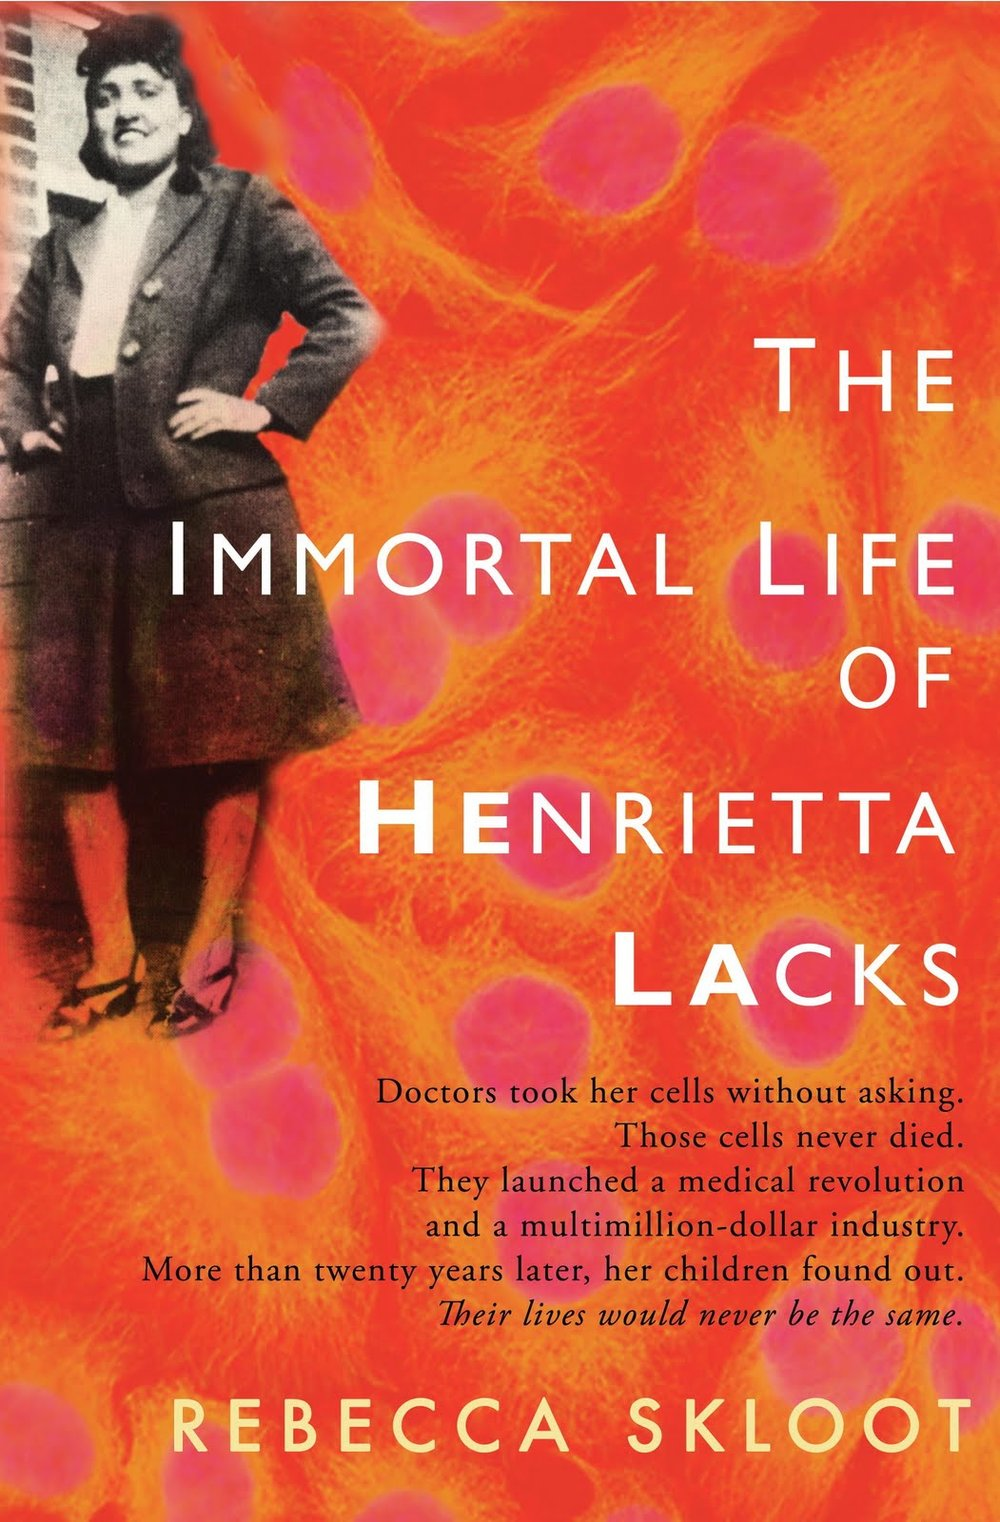 ImmortalLifeofHenriettaLacks-749798.jpg